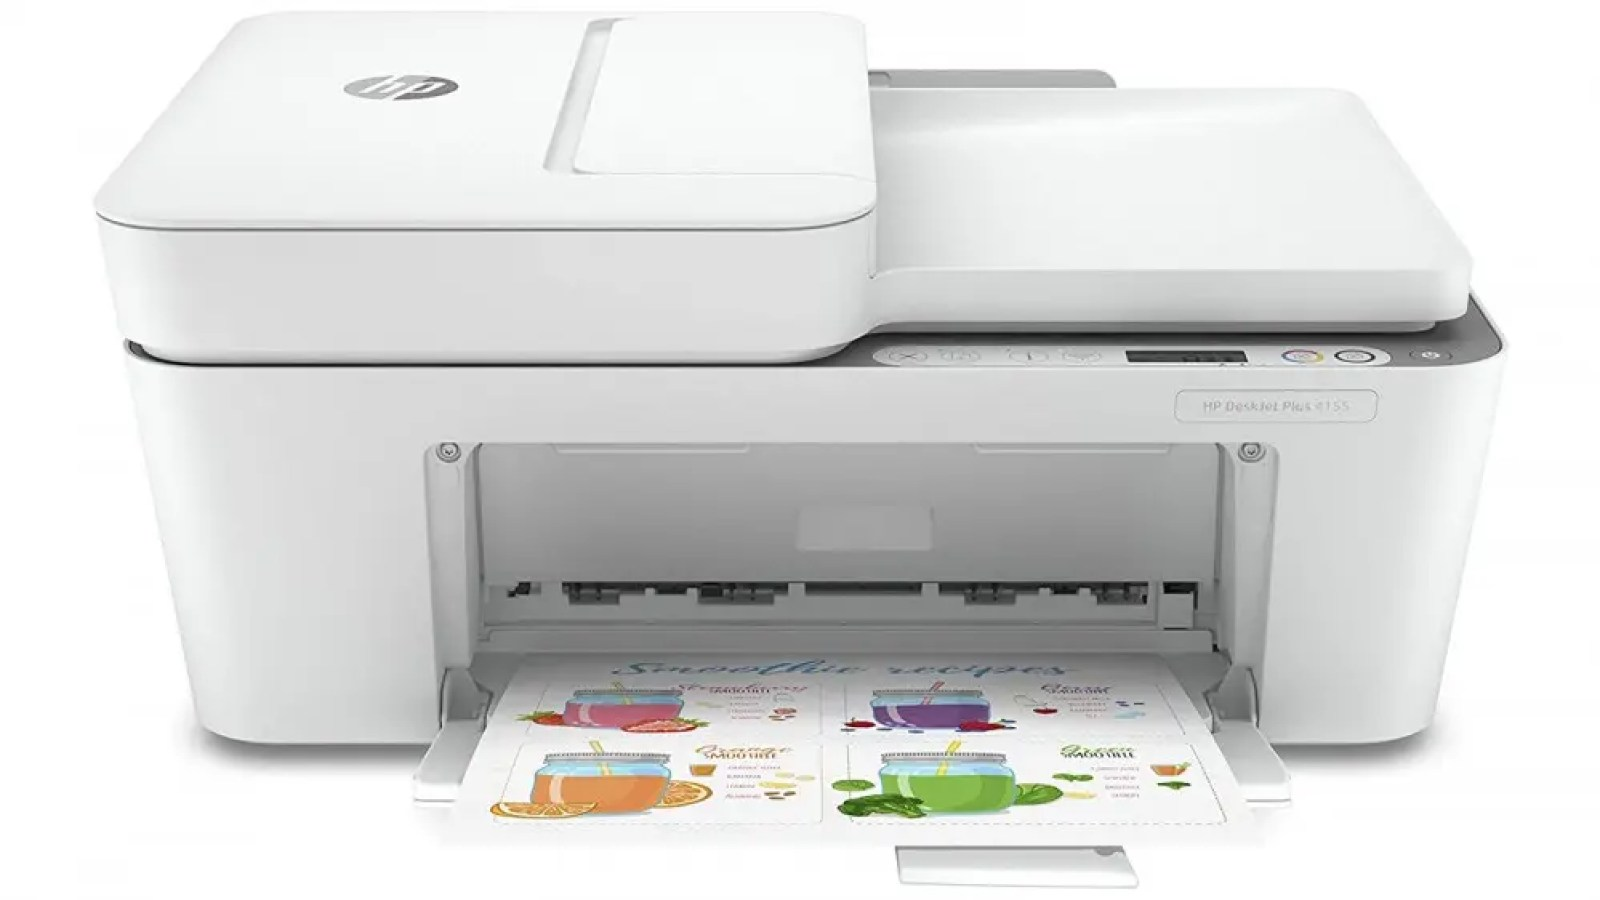 HP DeskJet 4155 Wireless All-in-One Printer